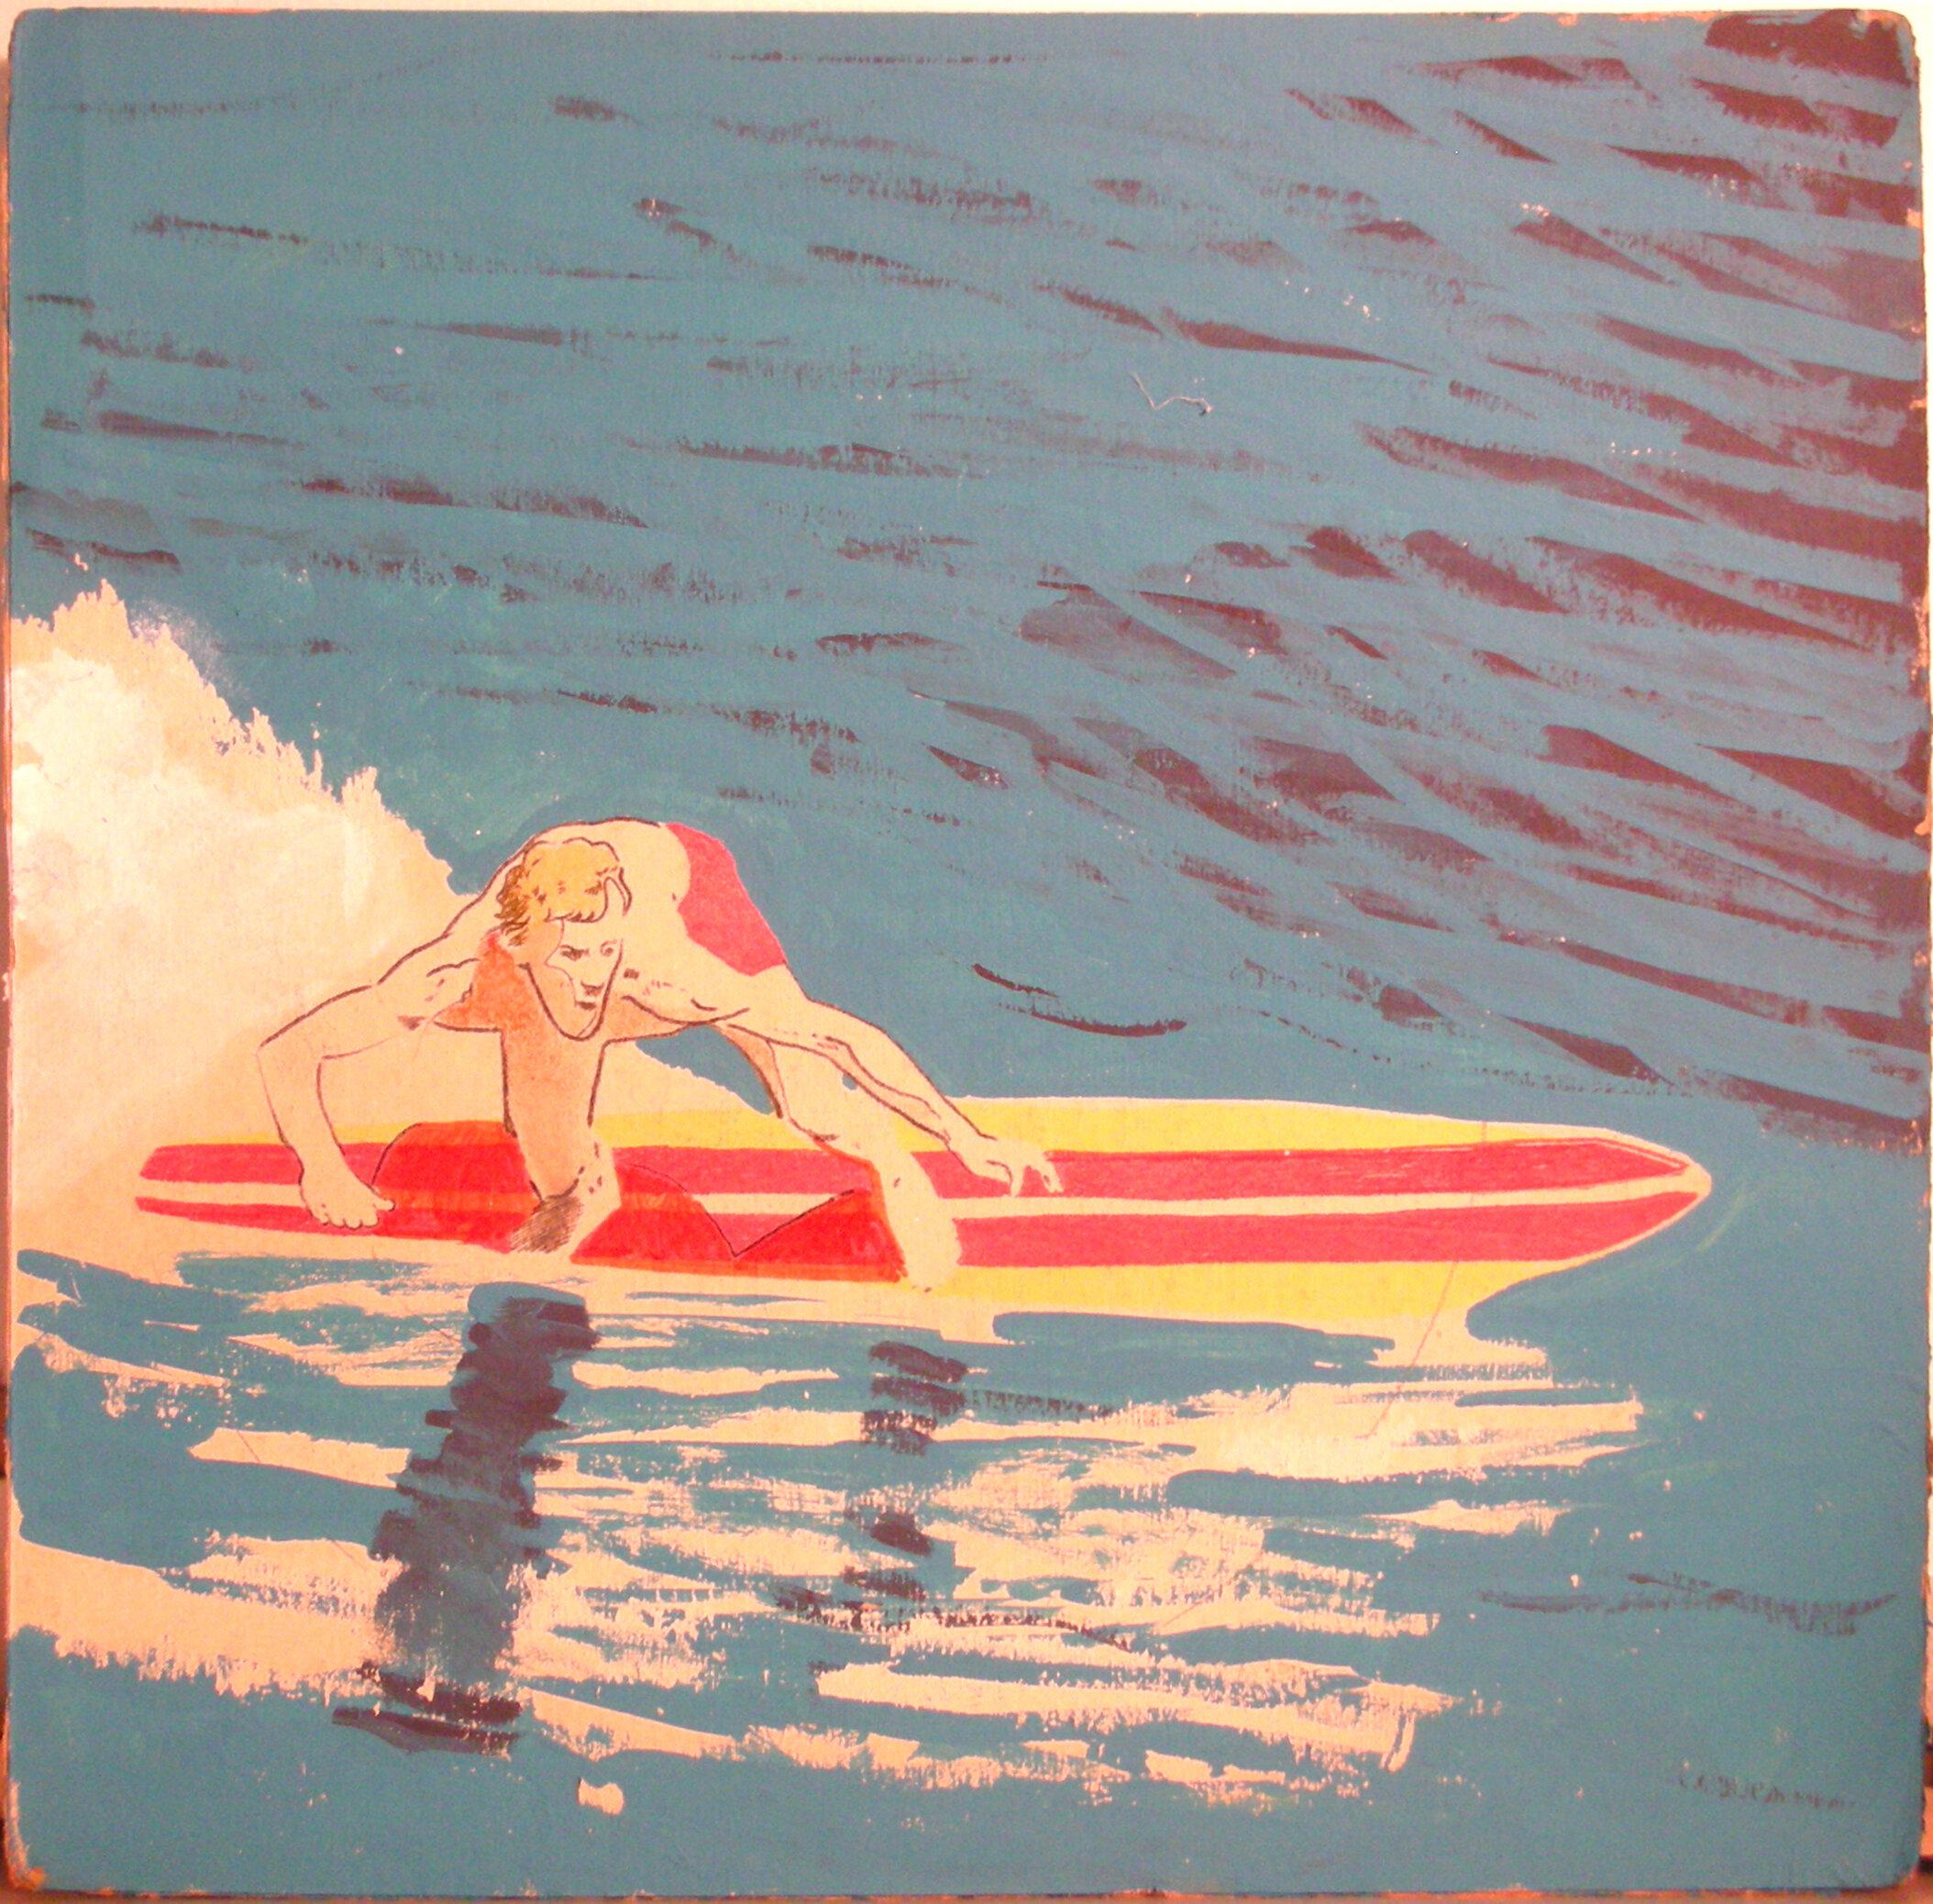 surfer001.jpg